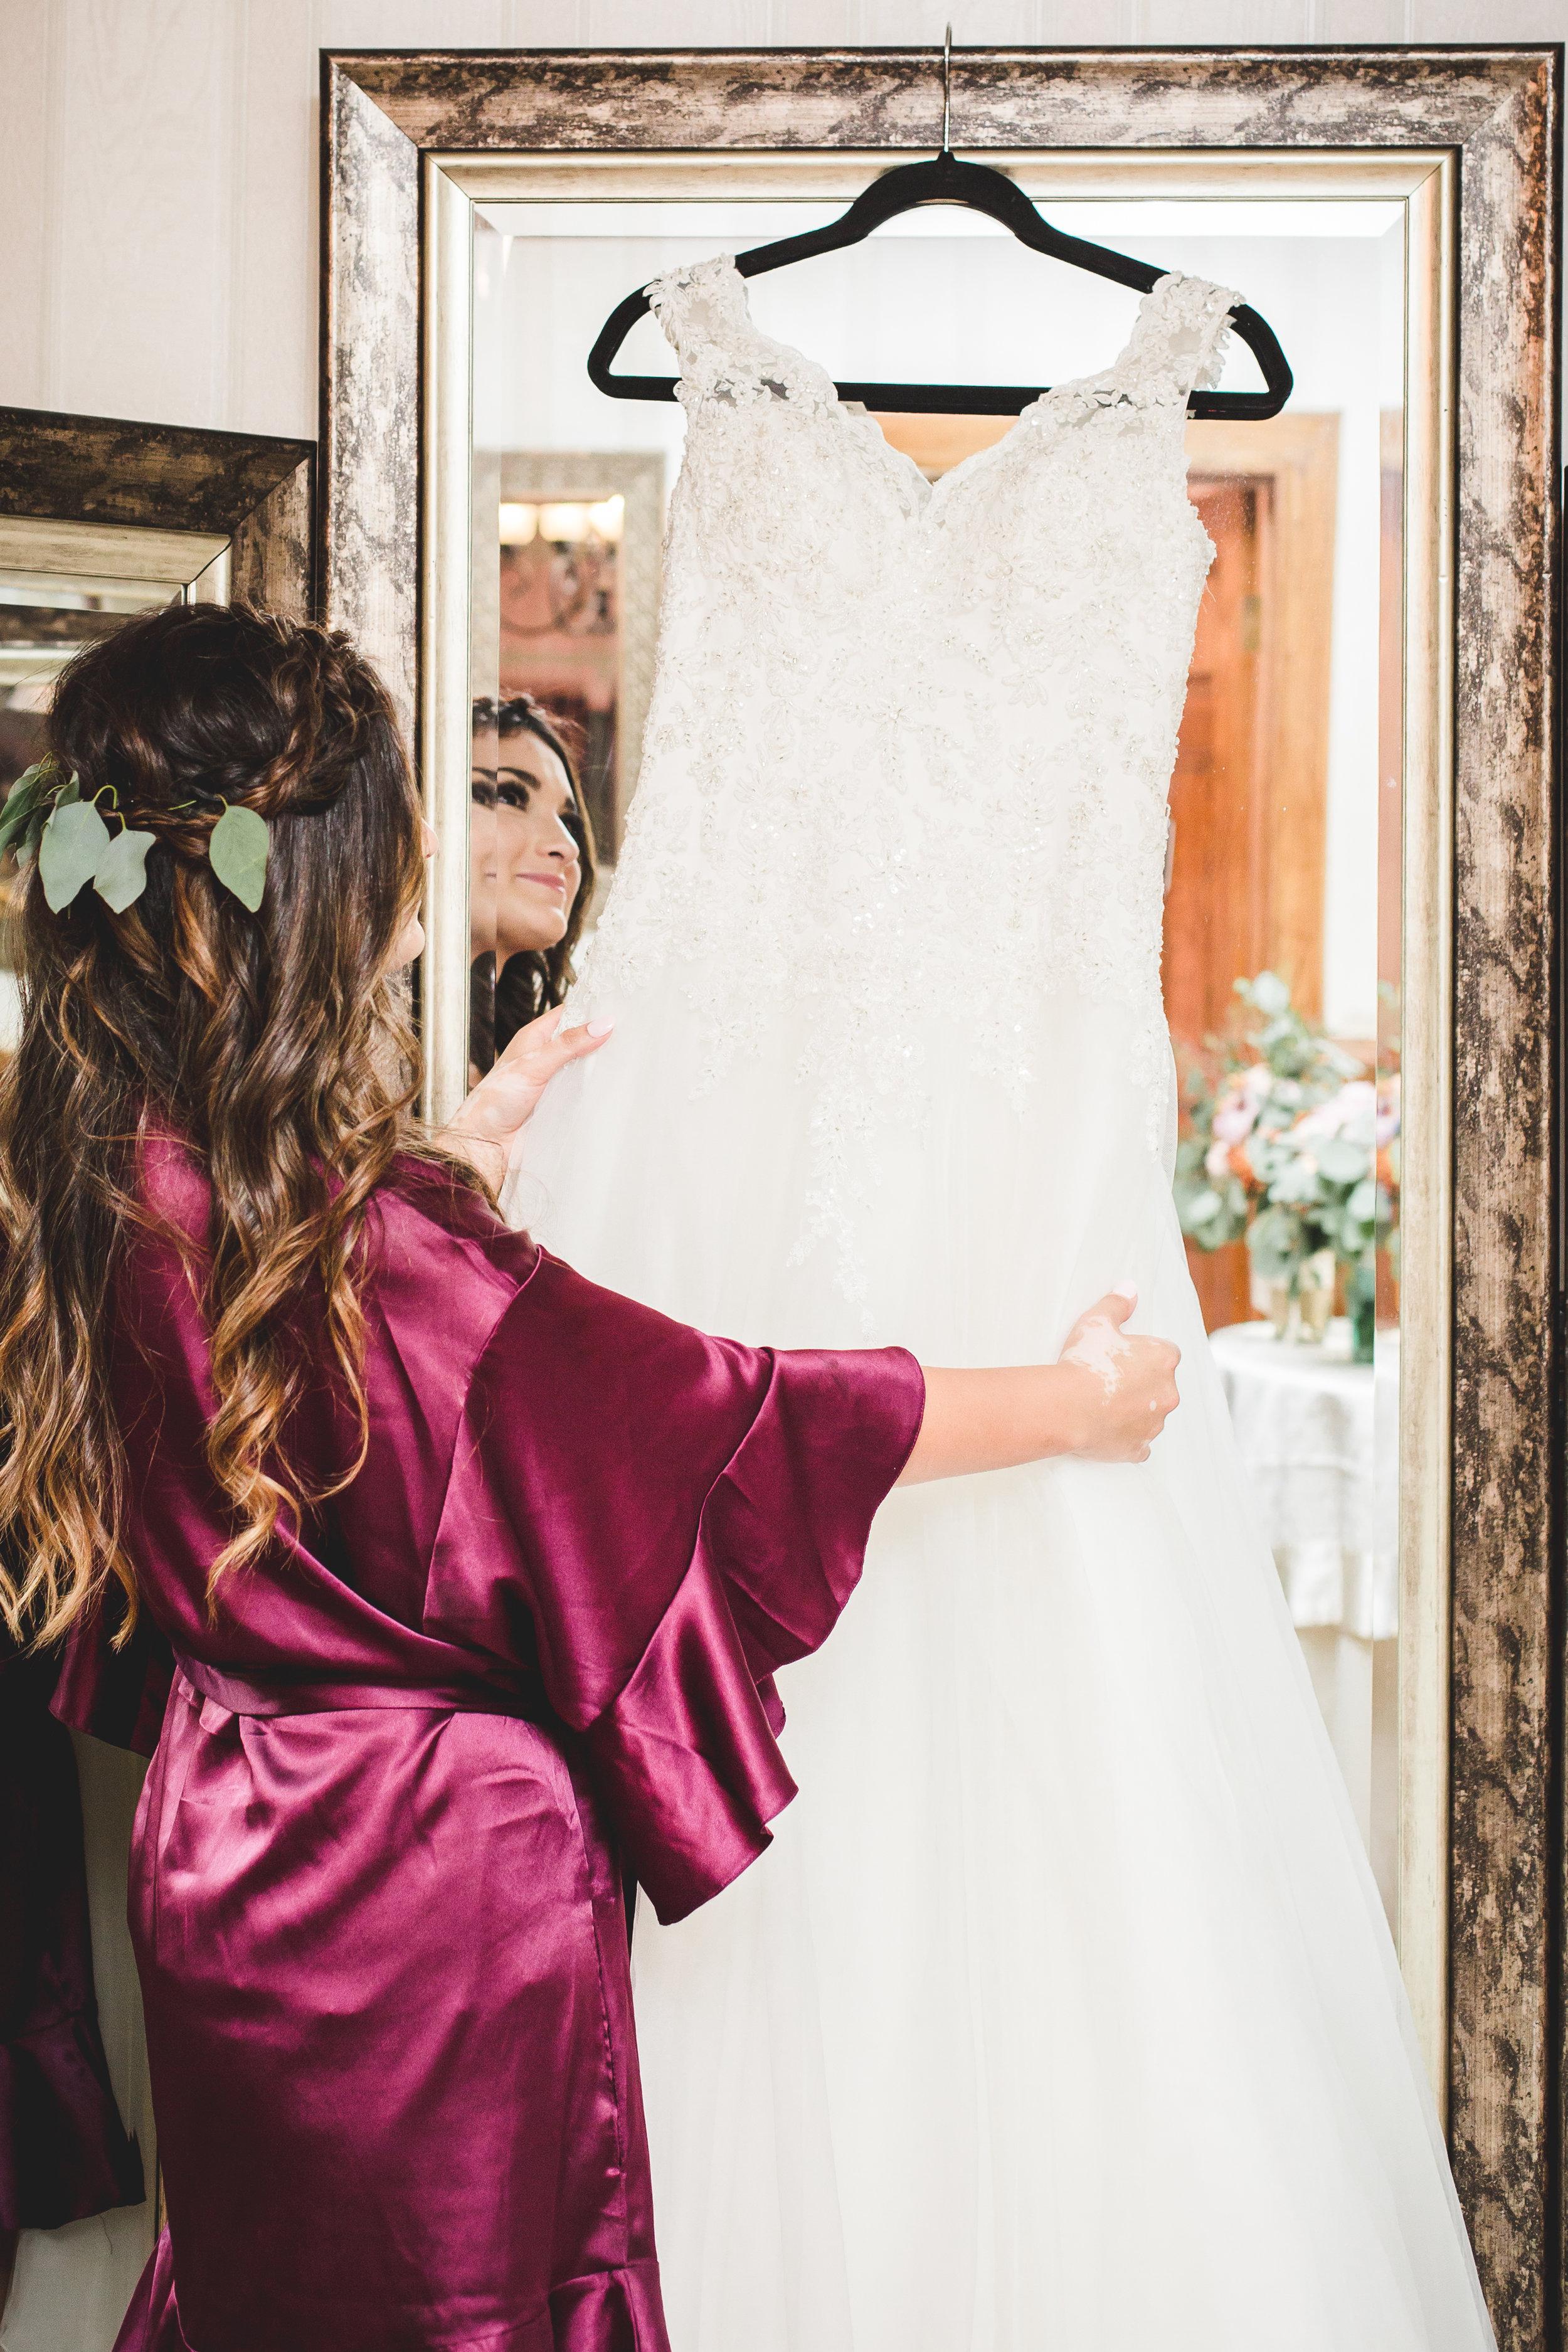 2018-09-07-WEDDING-MCBRIDE-TERRY-12.jpg